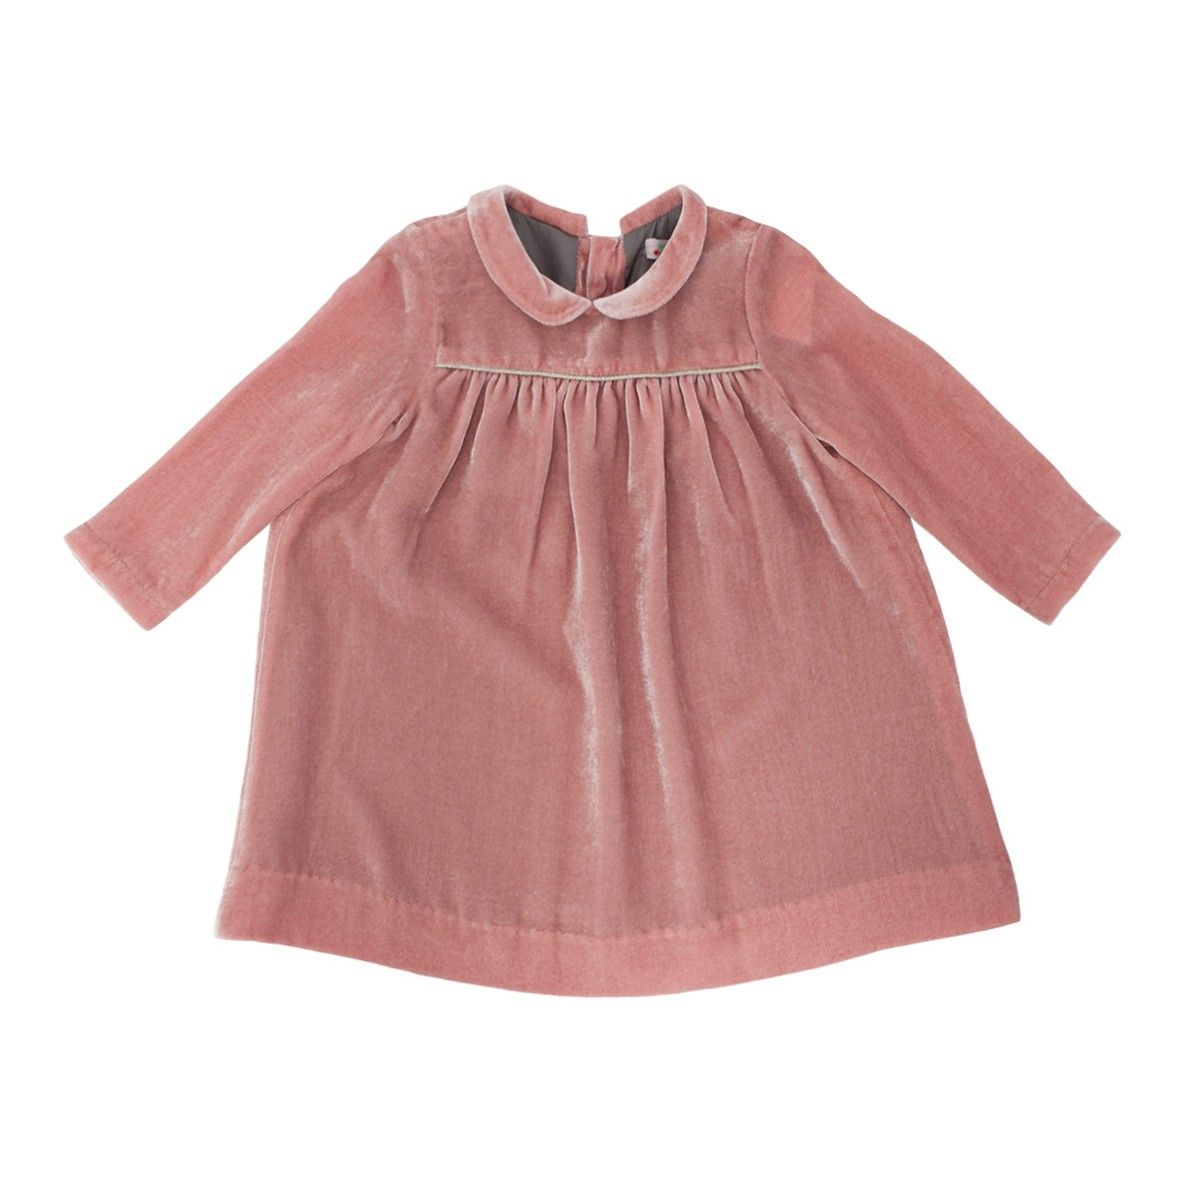 Bonpoint maxine dress